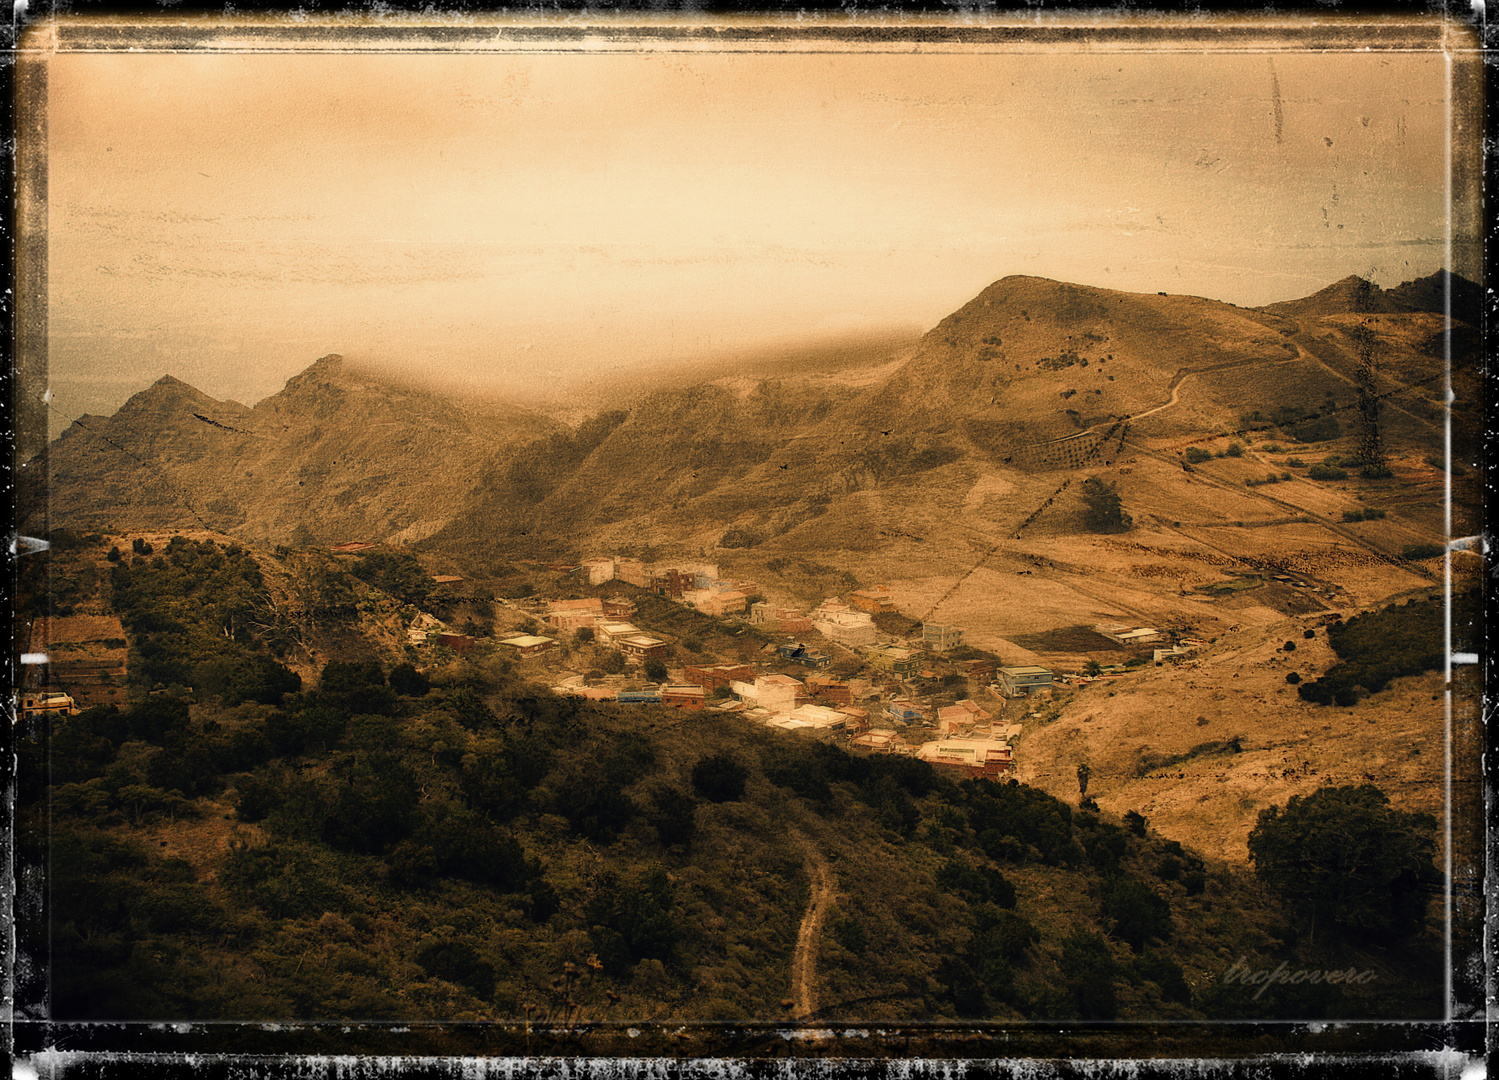 Viejo grabado con paisaje